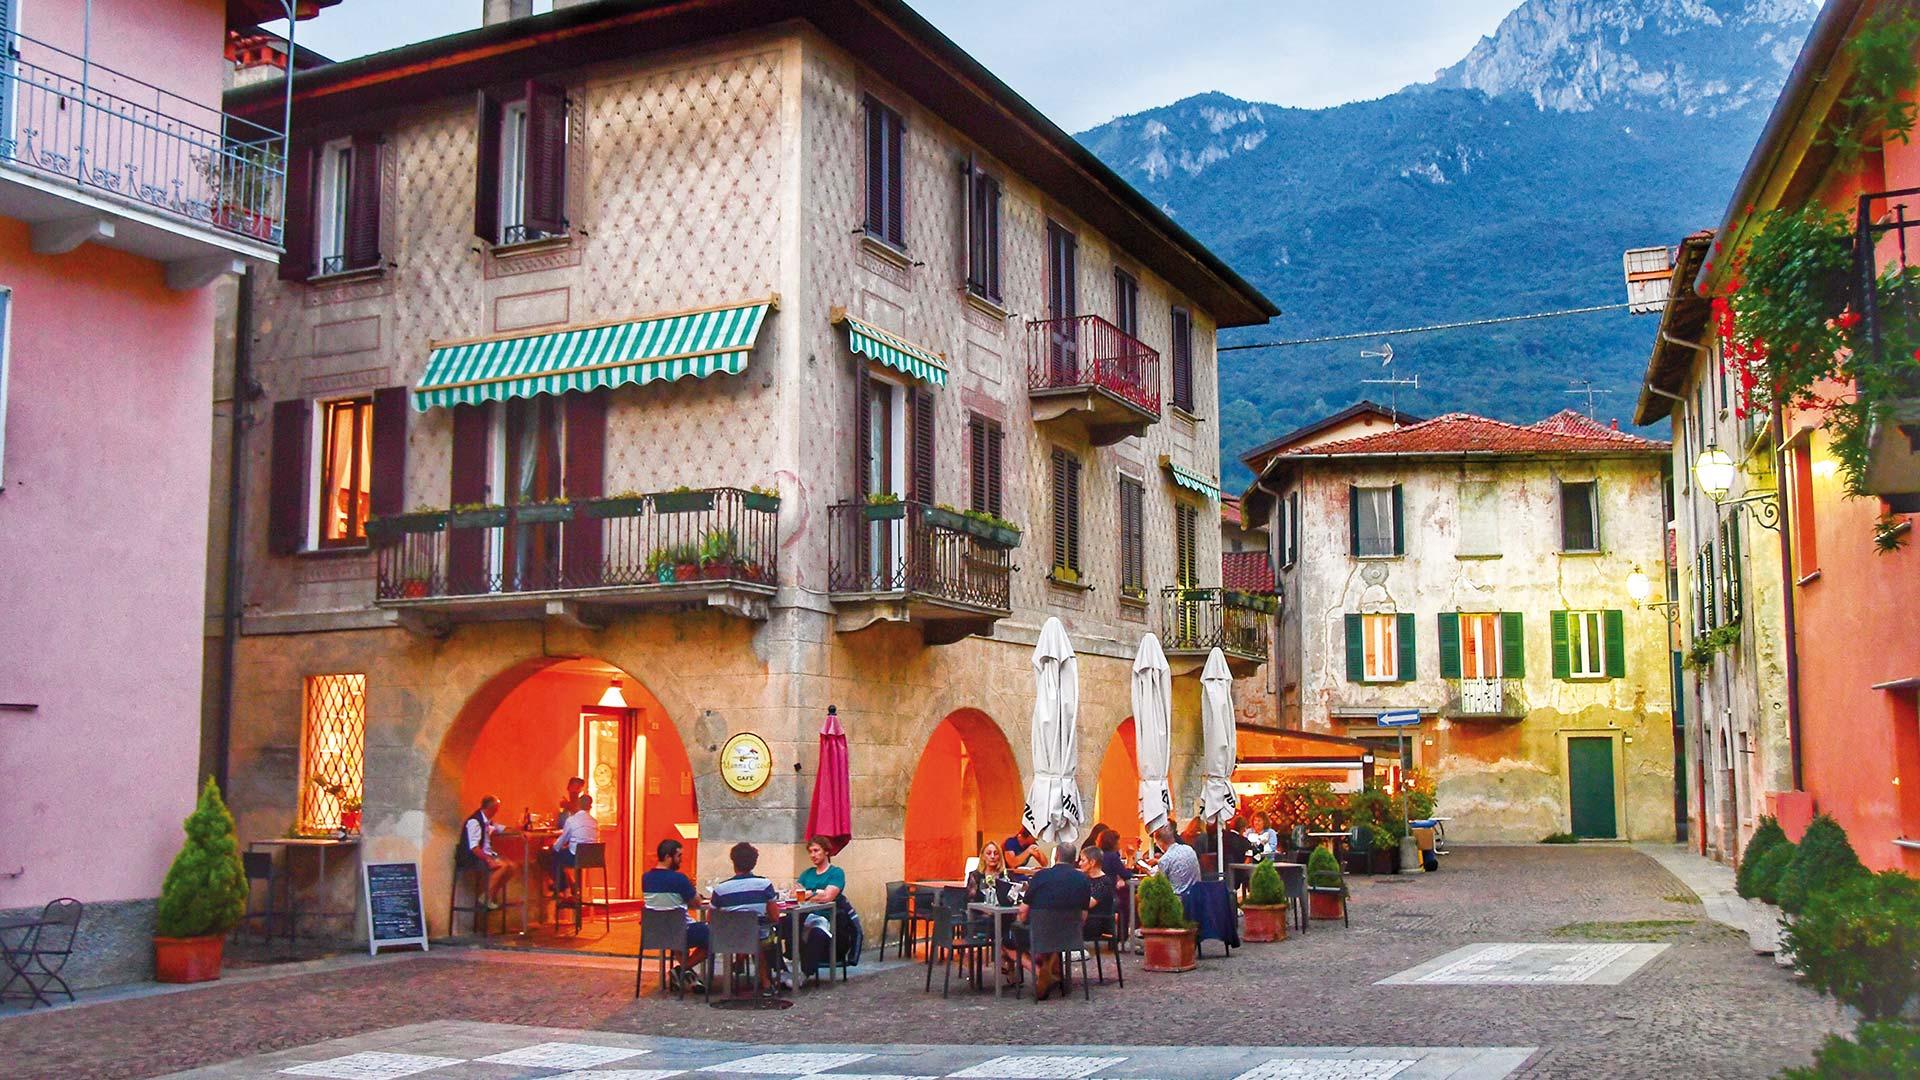 Saluti, Alpi Orobie! Tour 2